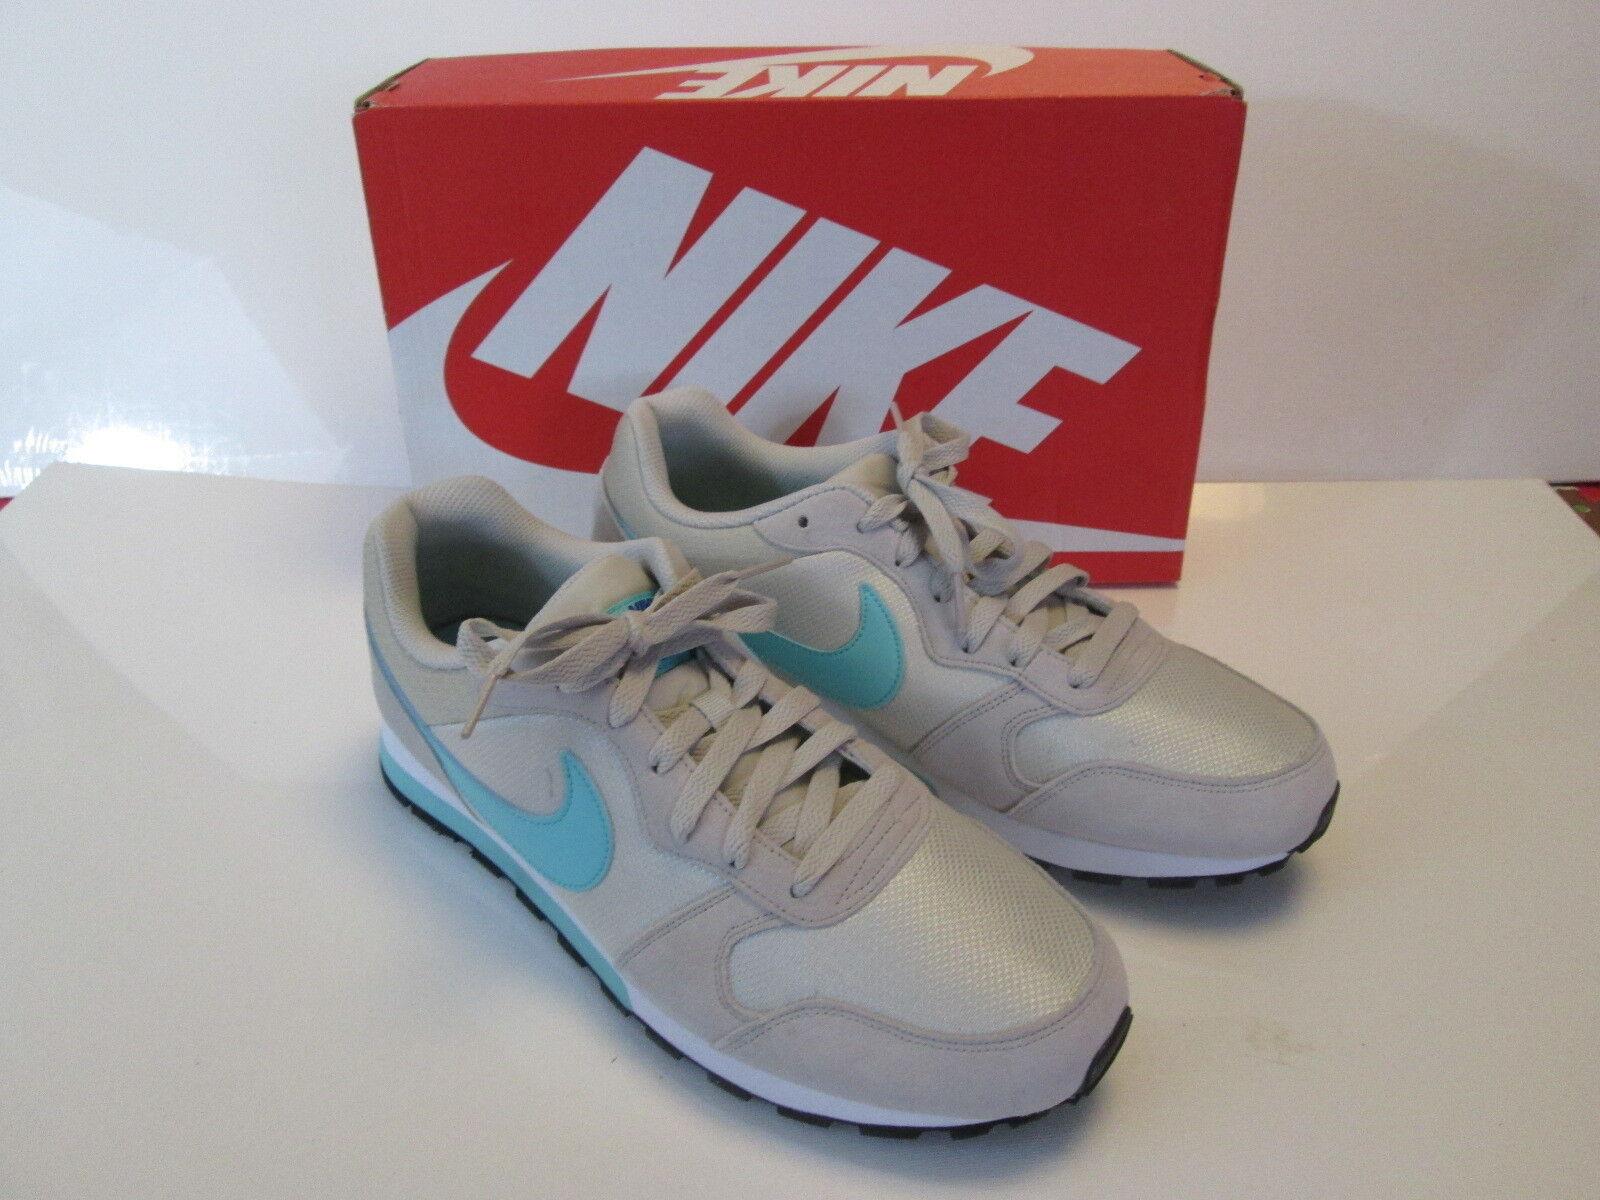 new style d2e14 9e475 Nike Nike Nike Women s MD Runner 2 Running Shoes Sneakers 749869 034 Lght  Bone Blue 11